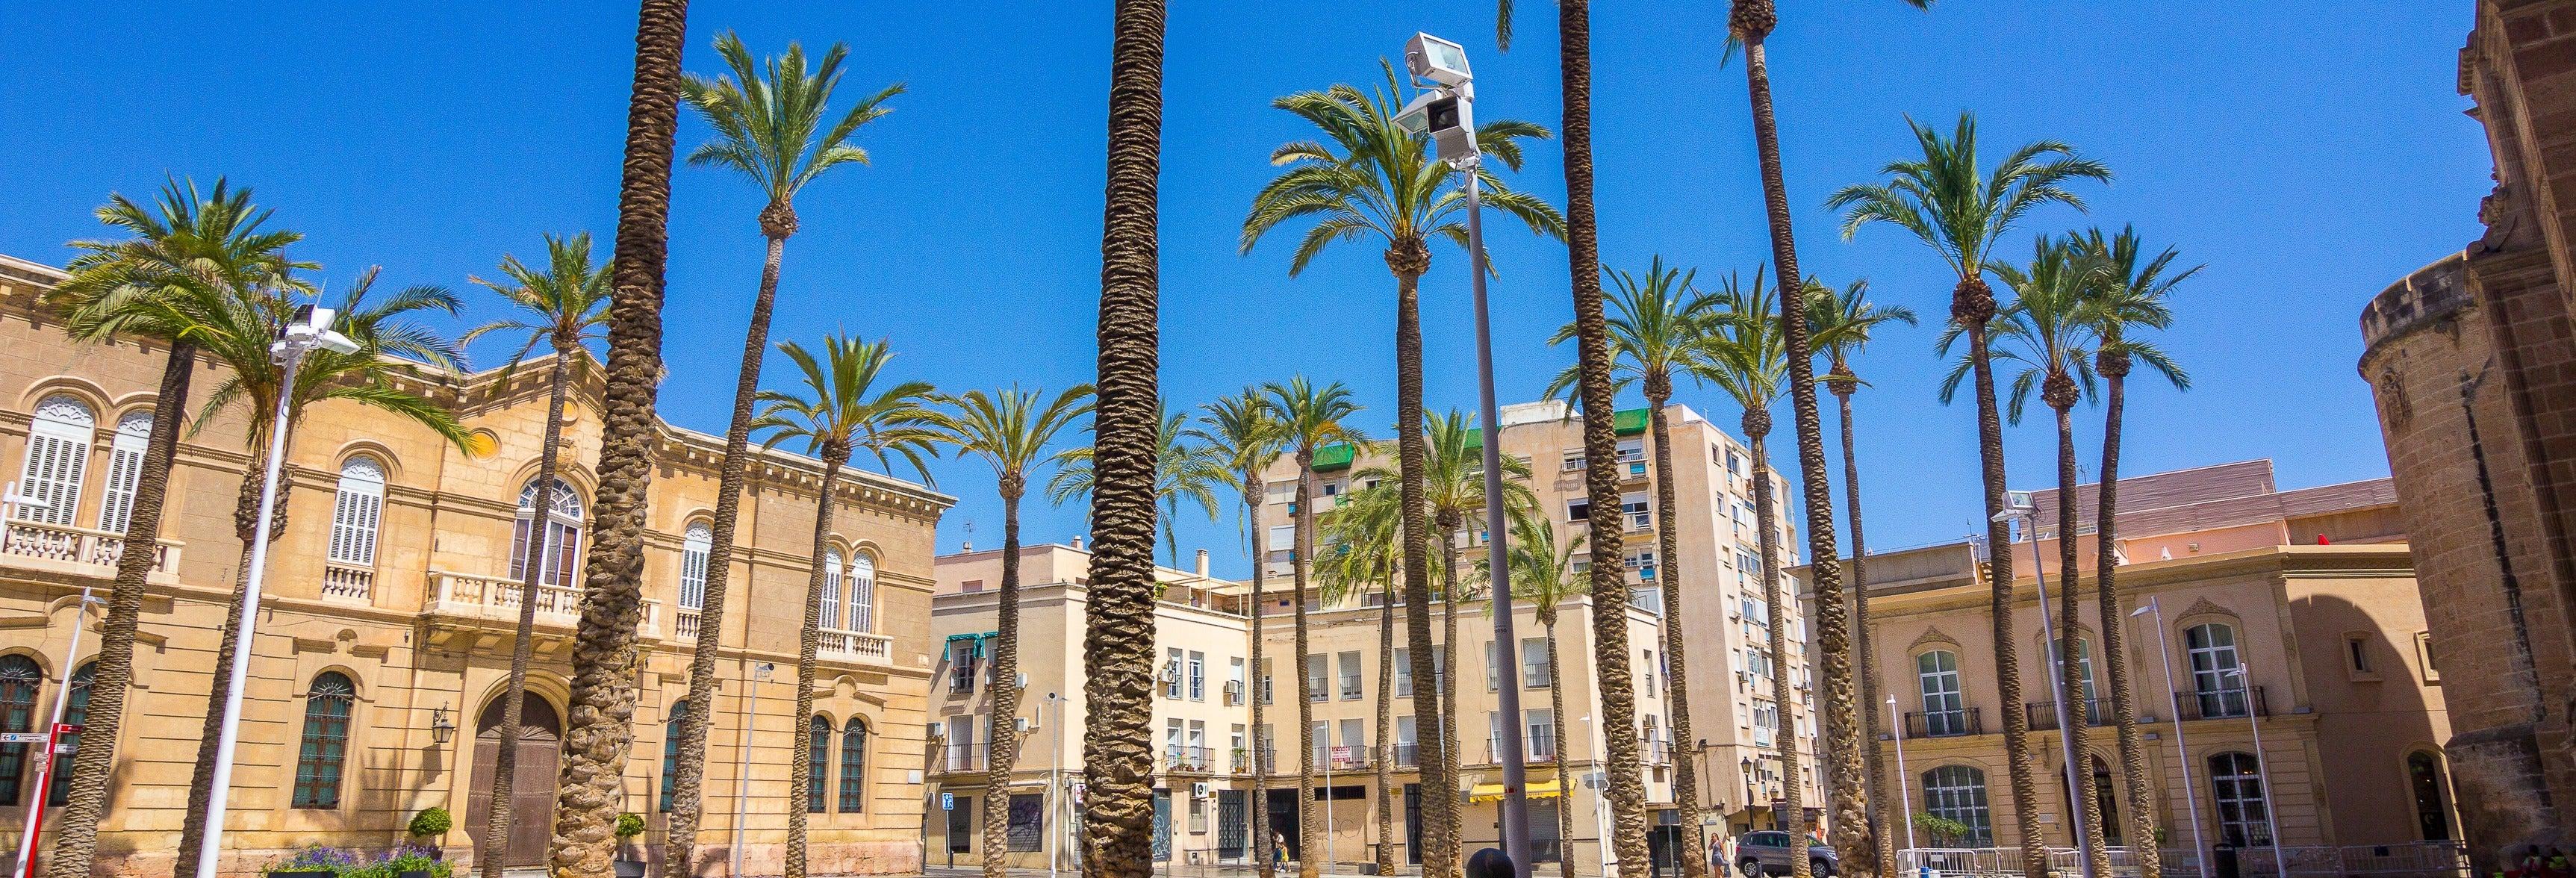 Guided Walking Tour of Almeria